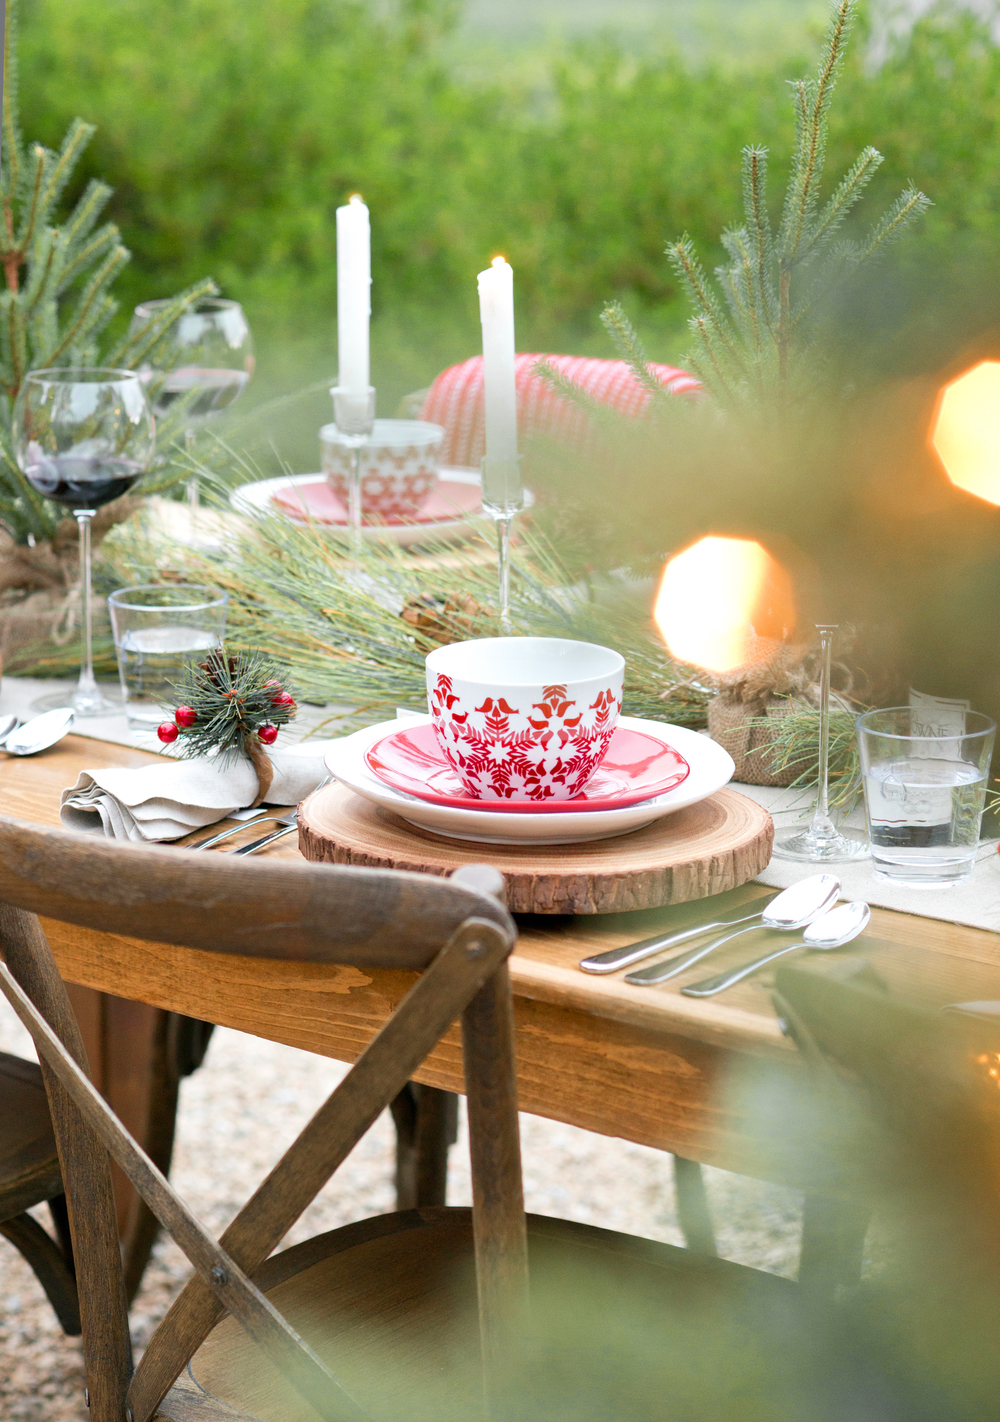 Crate & Barrel Christmas Tablescape - My Splendid Living Christmas Special Blog post - Christmas Amongst the Fir